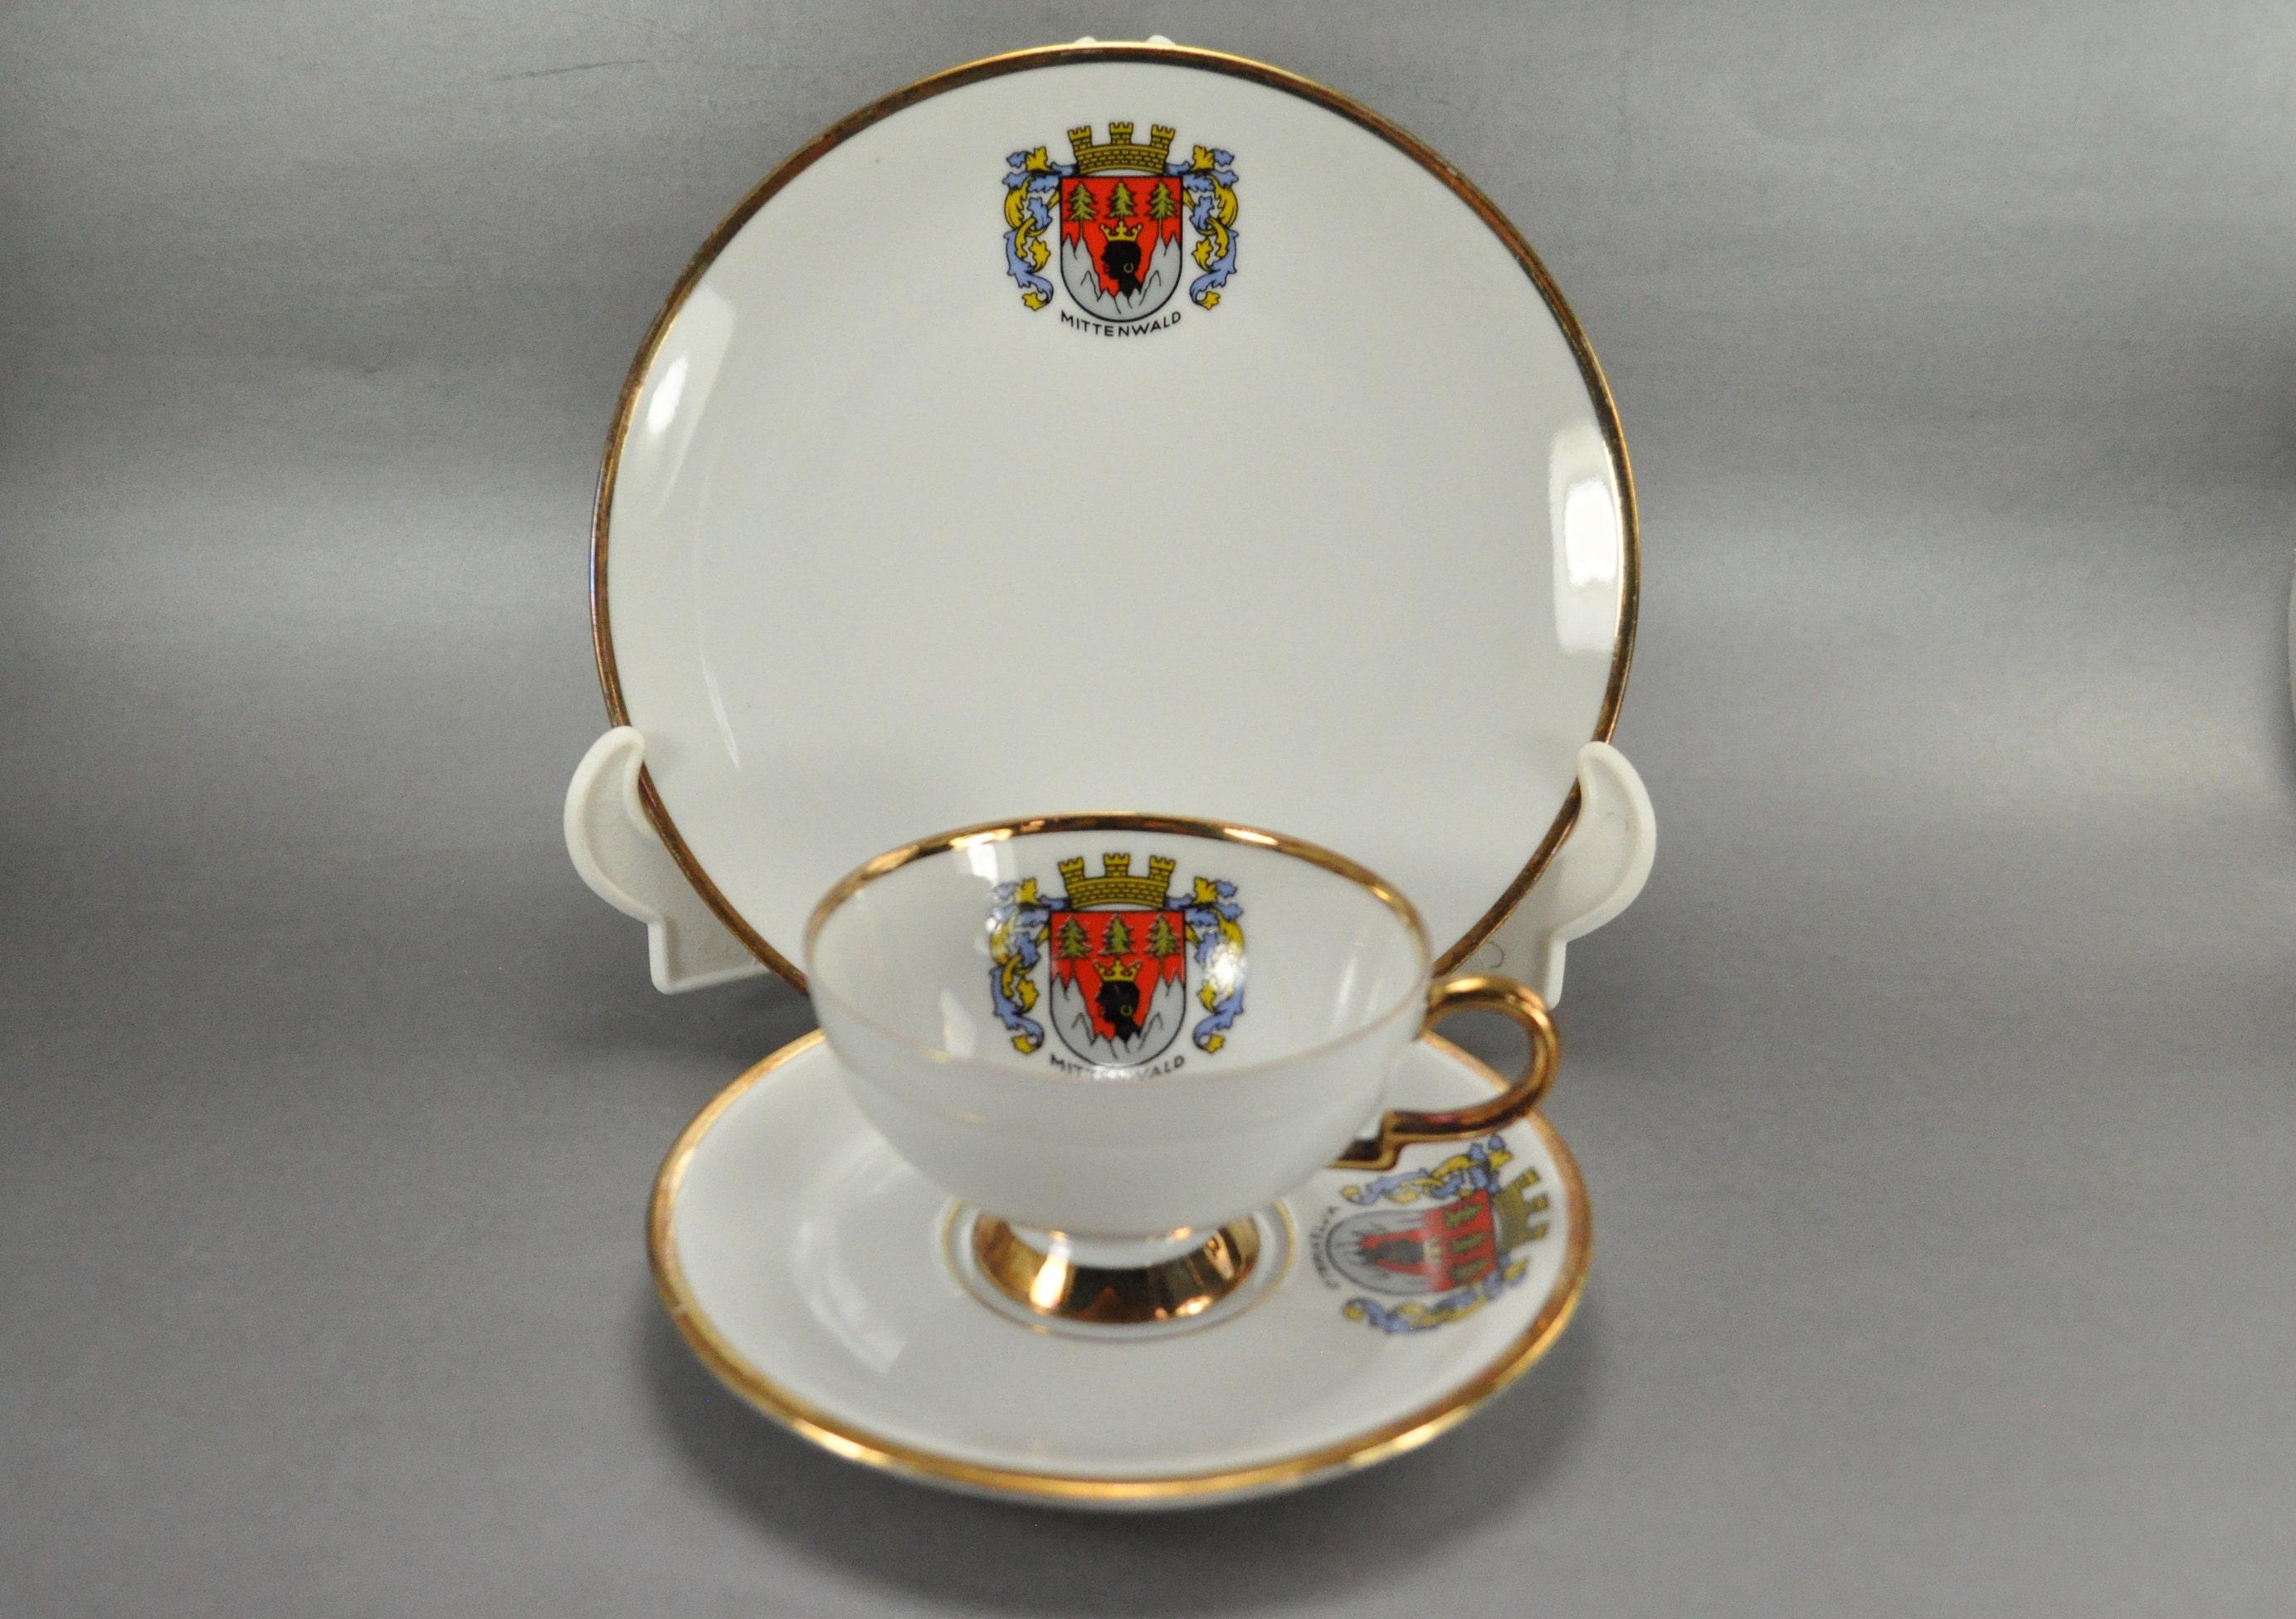 WB Bavaria Germany Mittenwald Crest 3 Piece Porcelain Tea